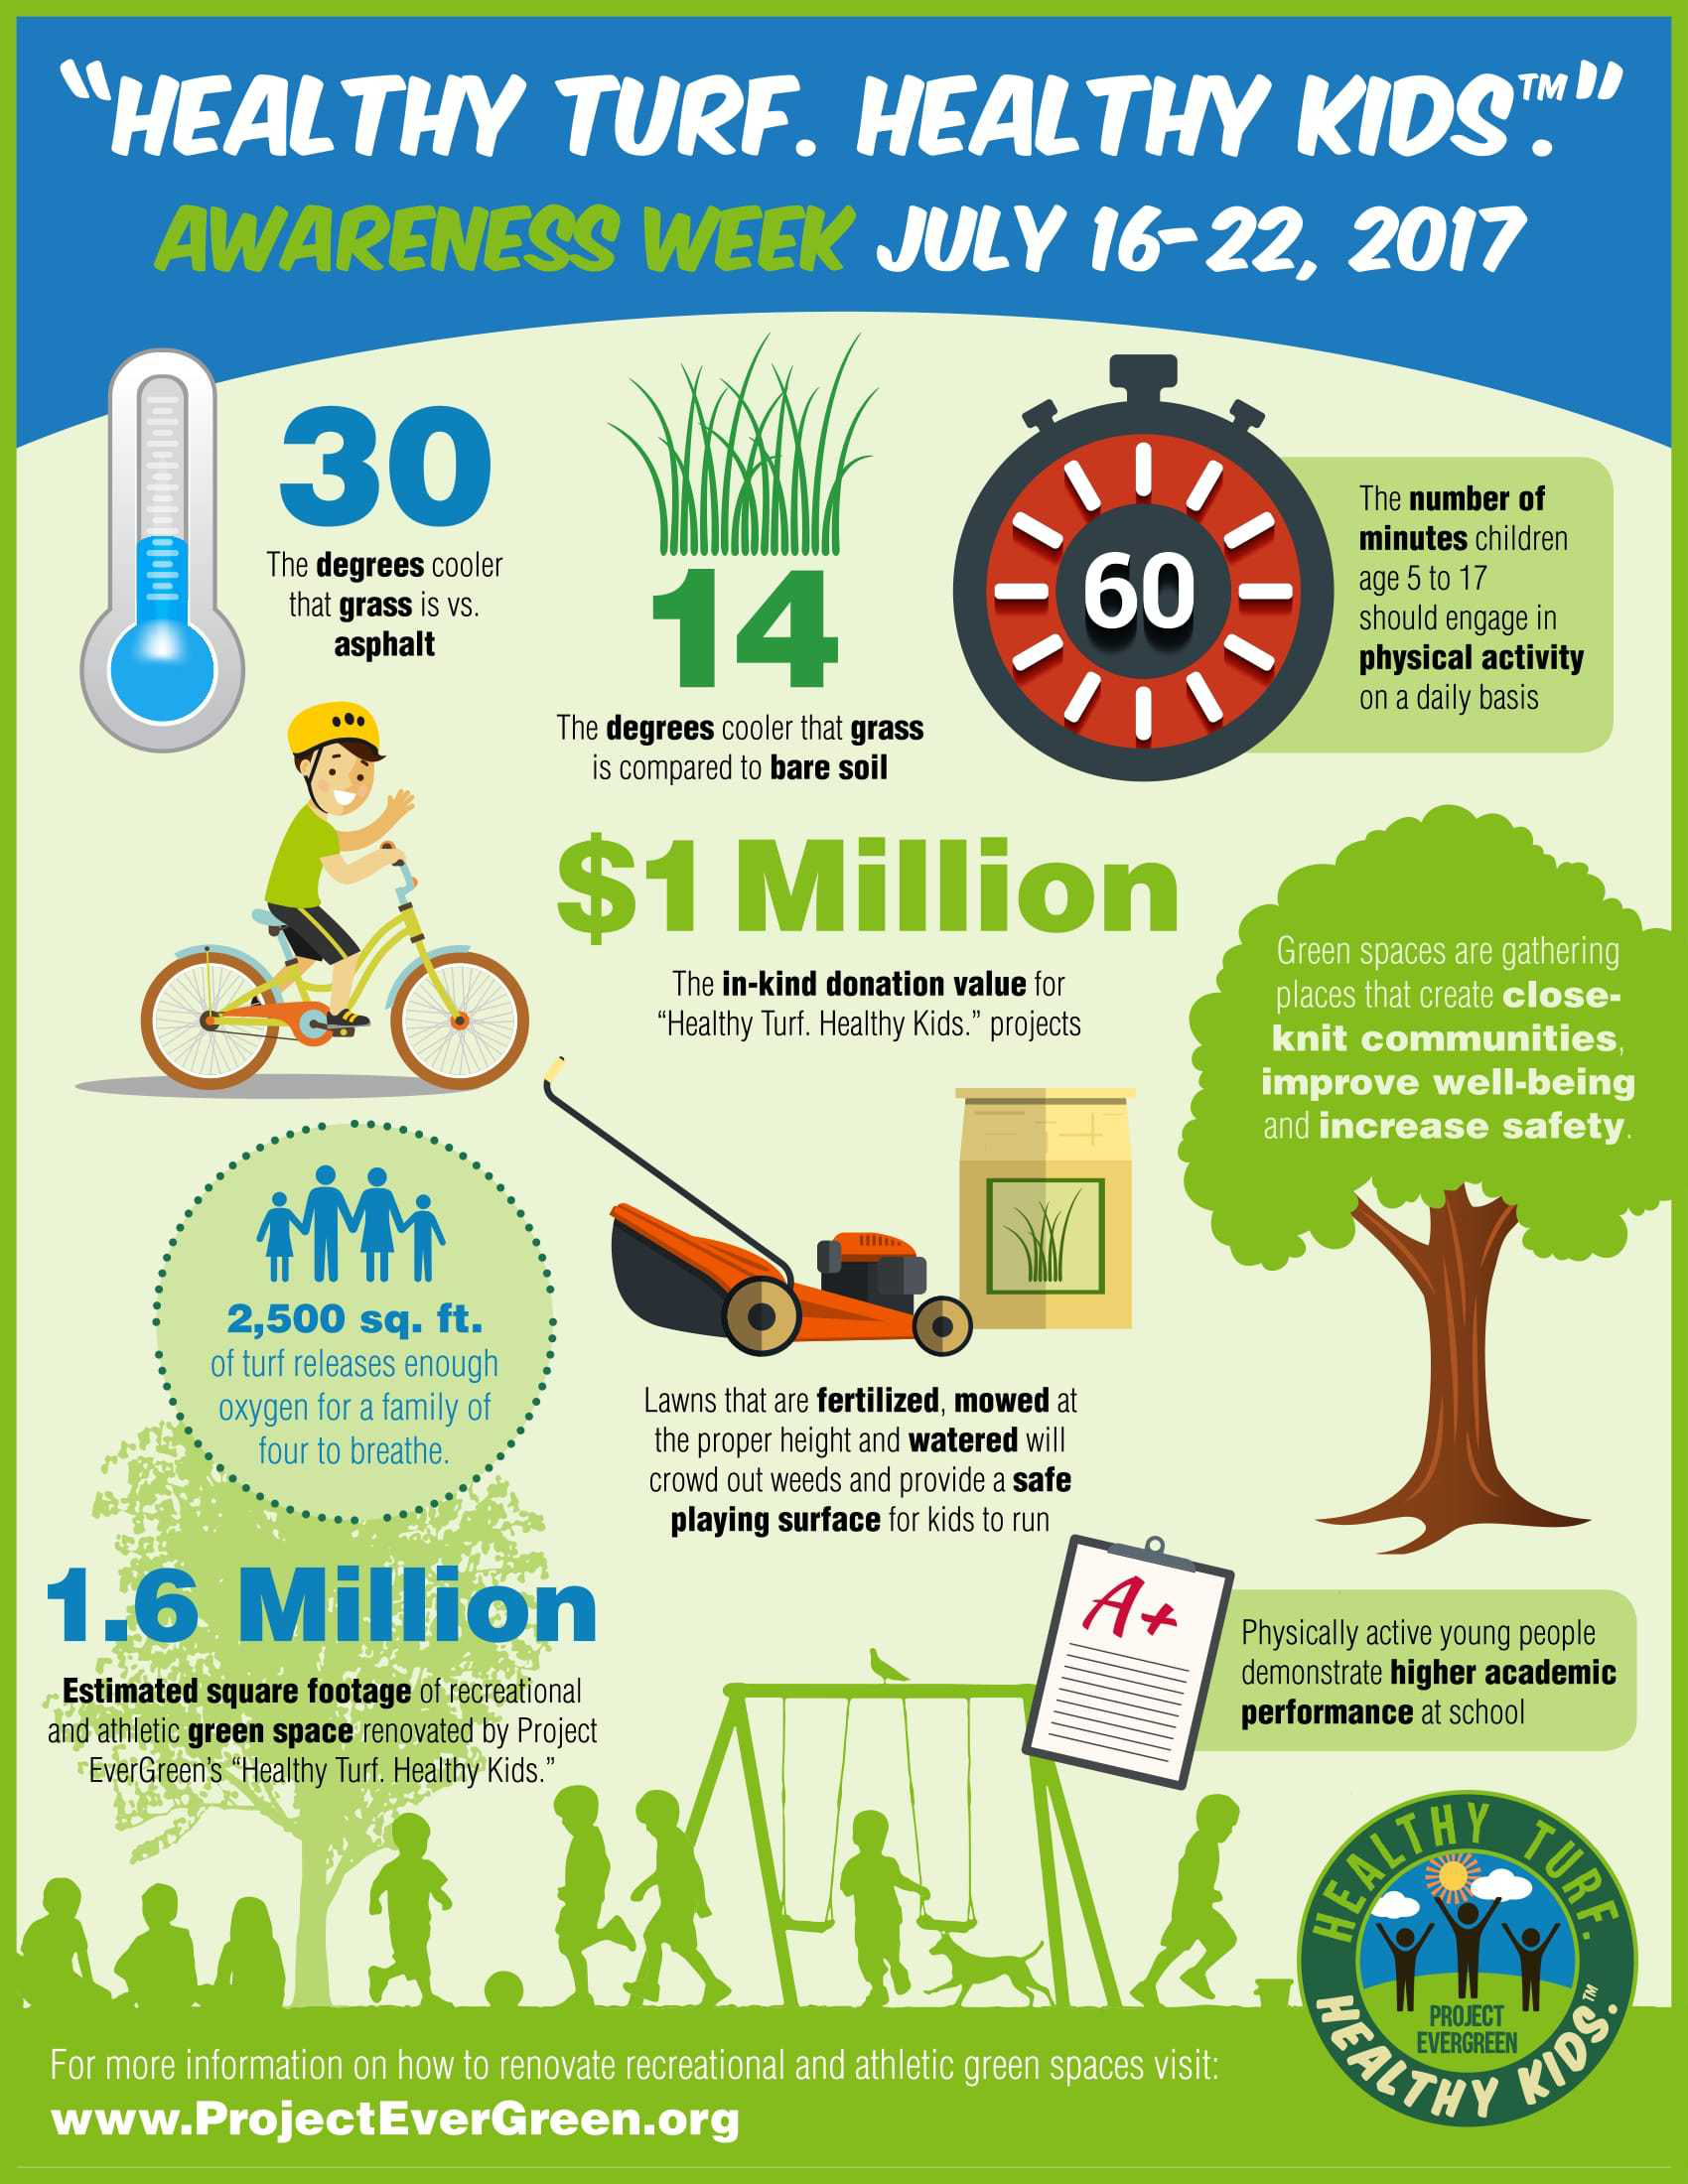 2017 HTHK Awareness Week Infographic-1